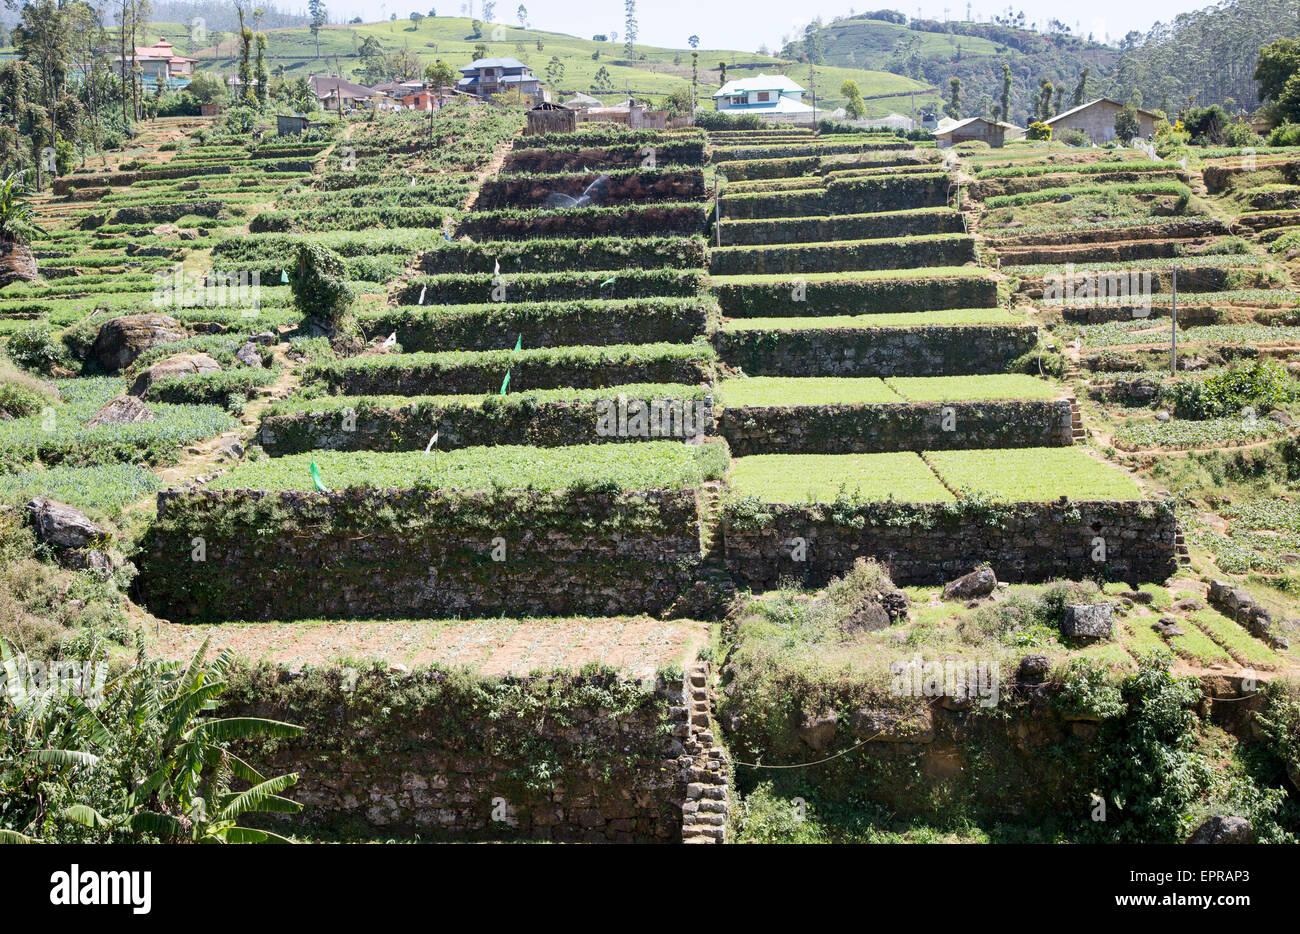 Intensive subsistence terraced farming near Nuwara Eliya, Central Province, Sri Lanka, Asia - Stock Image